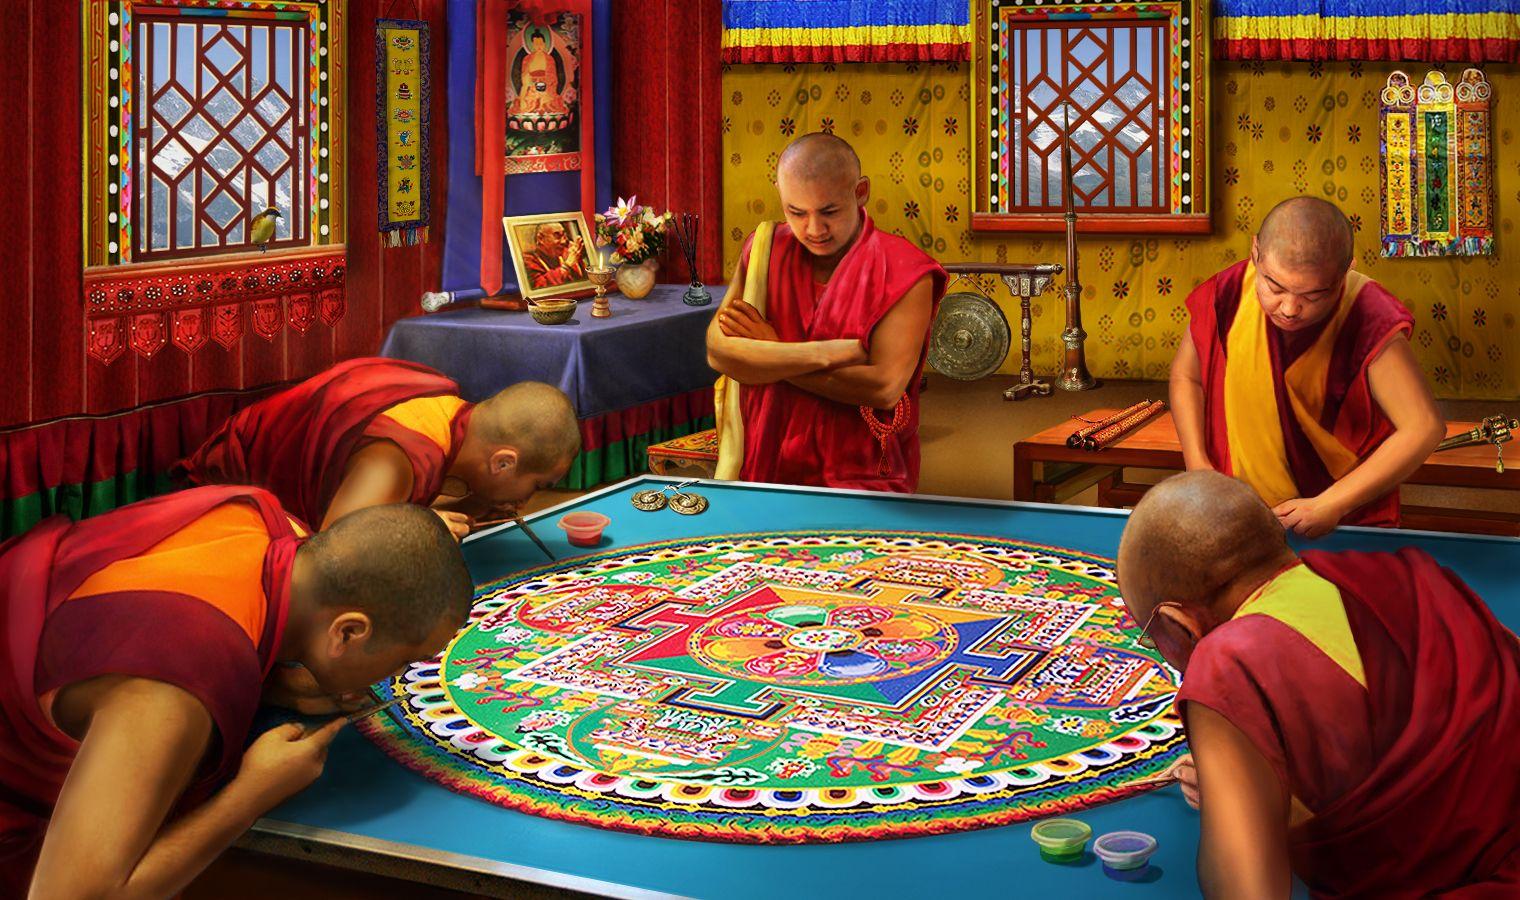 Gardens of Time Sand Mandala The incredibles, Mandala